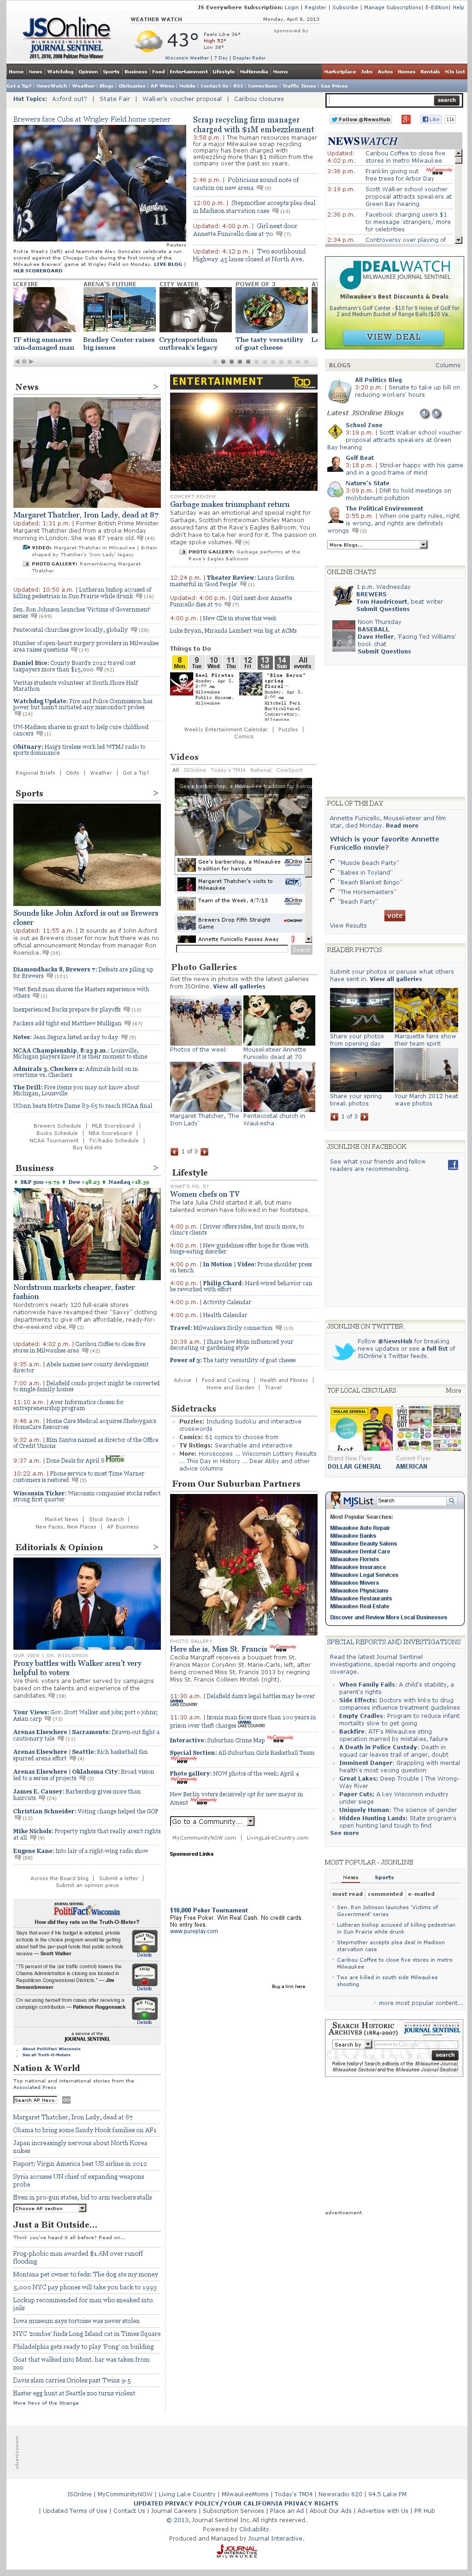 Milwaukee Journal Sentinel at Monday April 8, 2013, 9:14 p.m. UTC